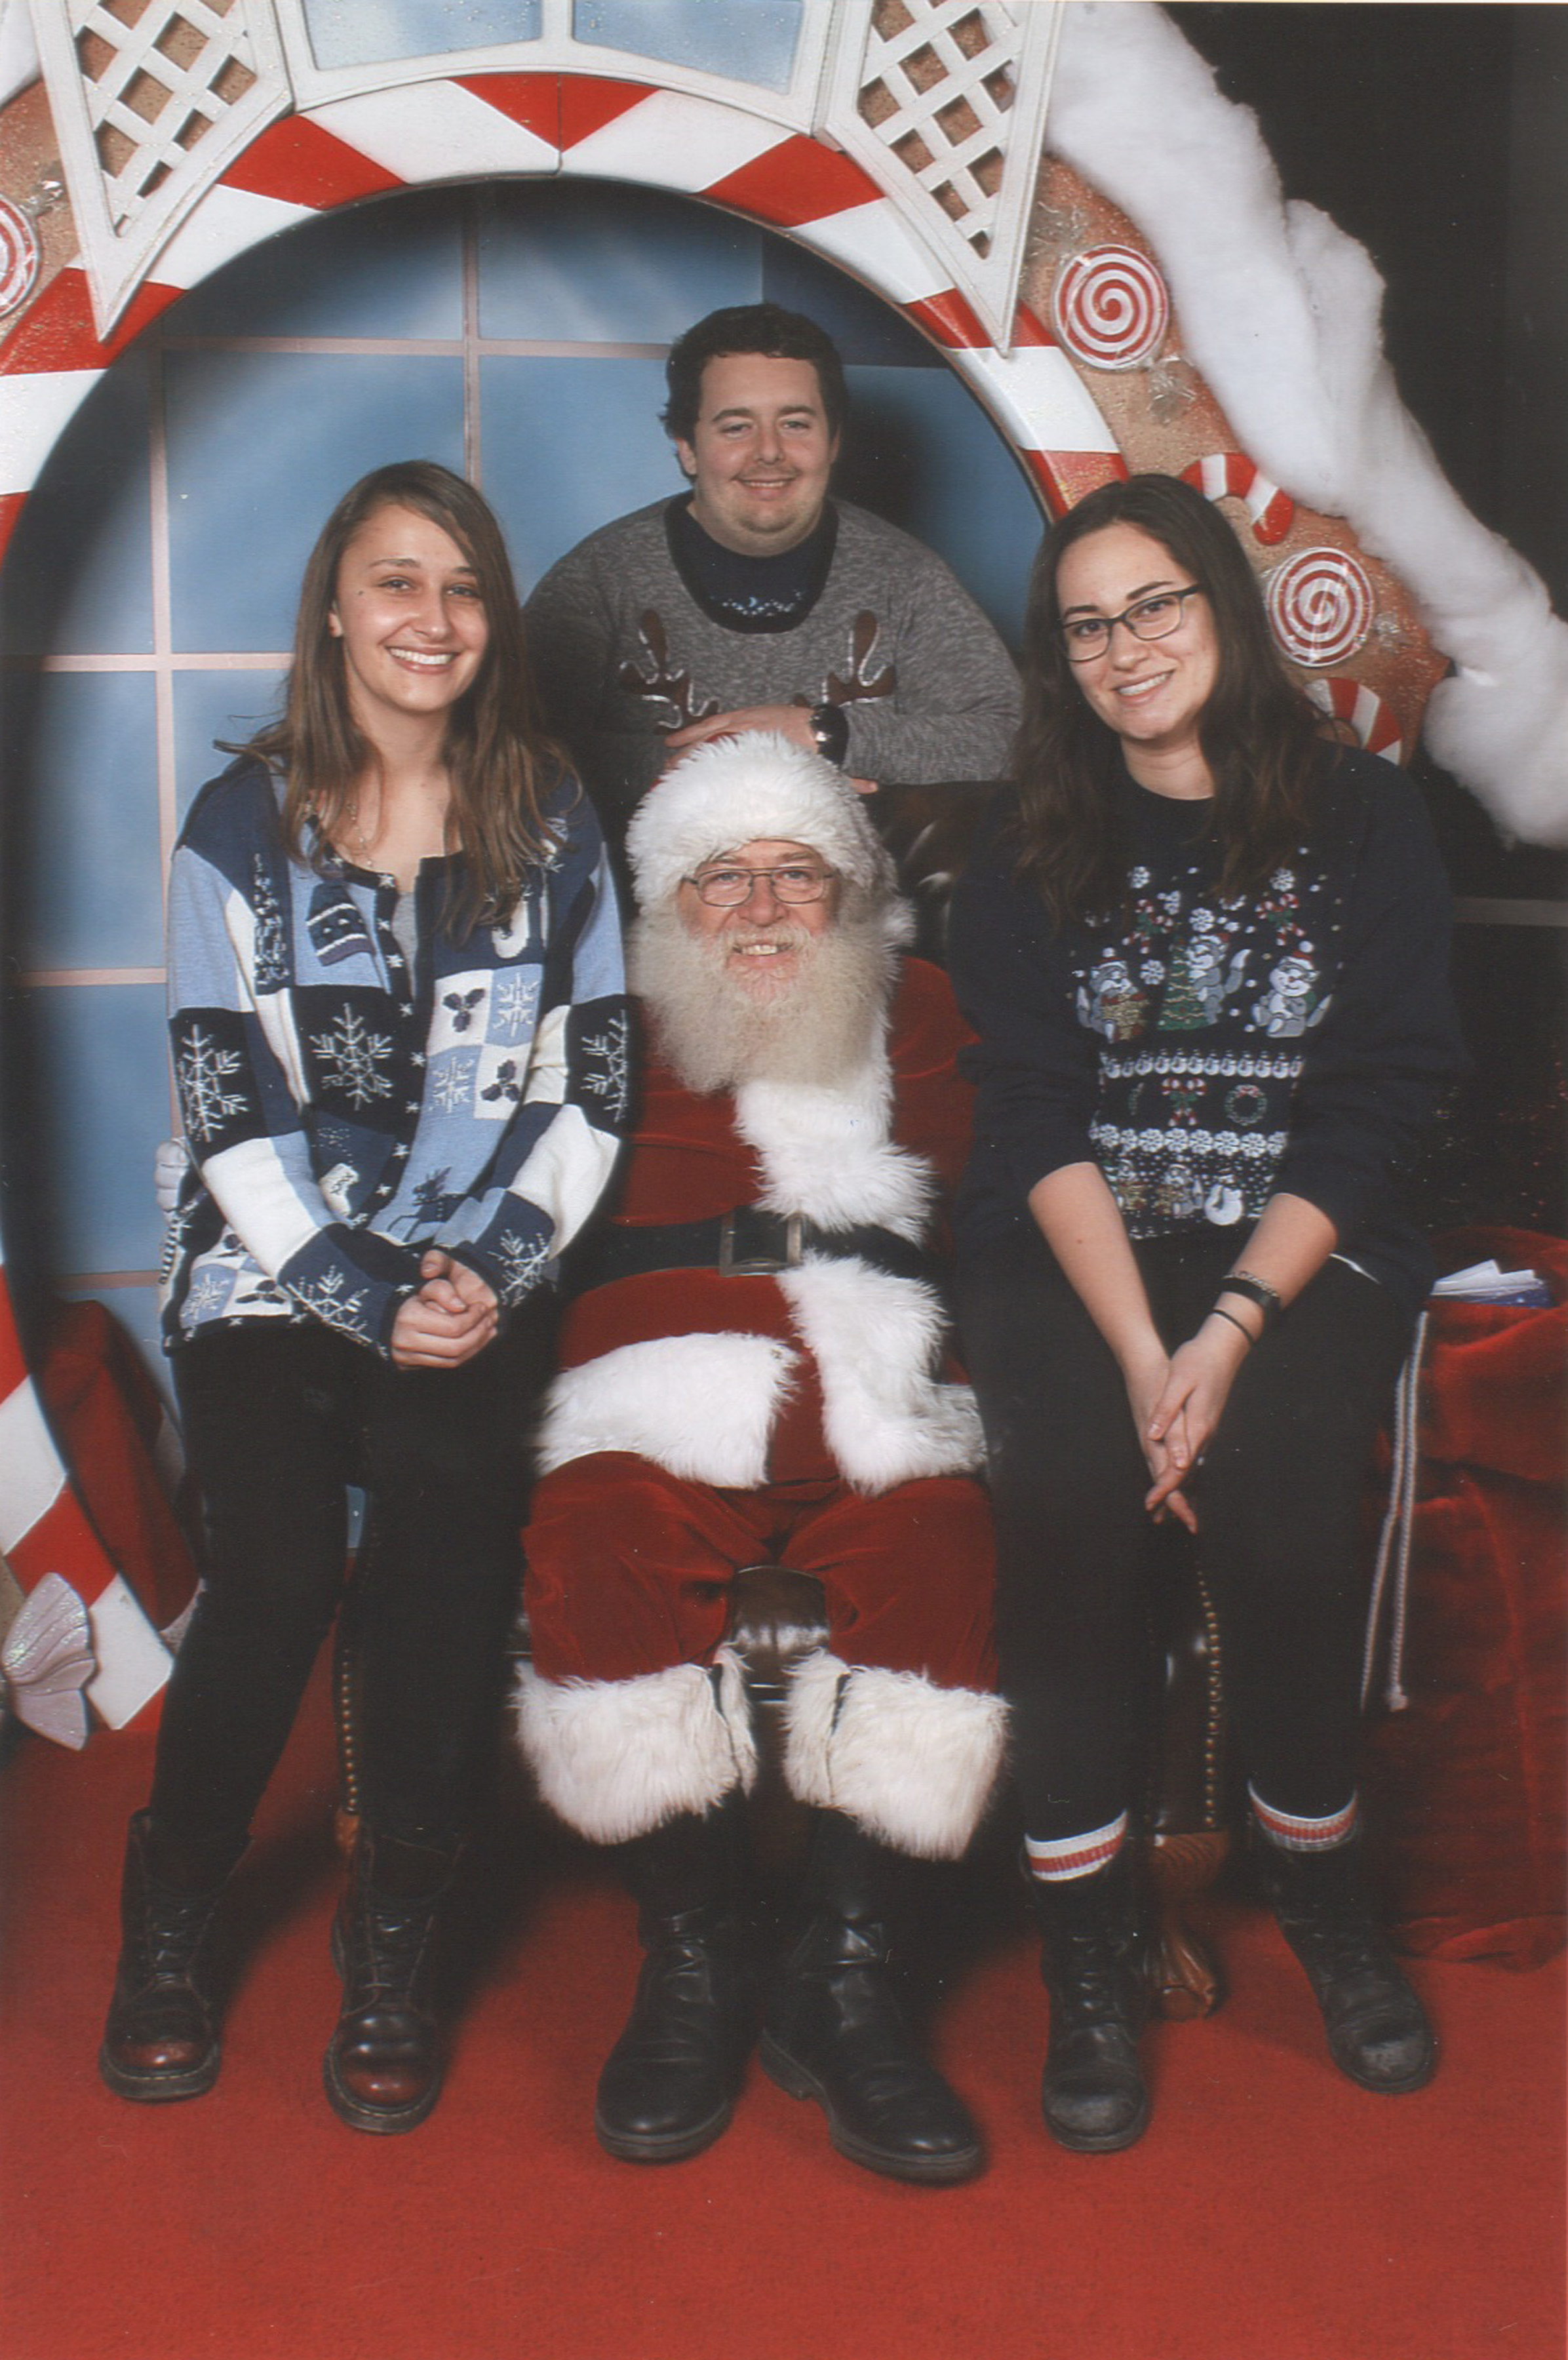 Fitzpatrick lab student with Santa